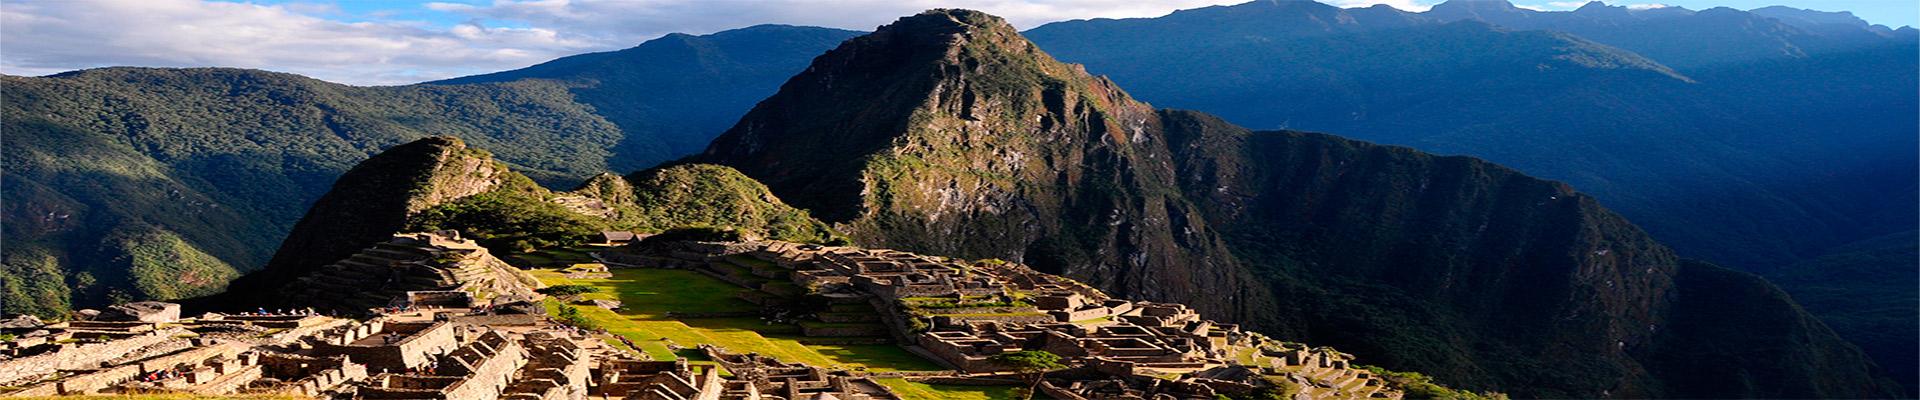 Lima e Machu Picchu Completo